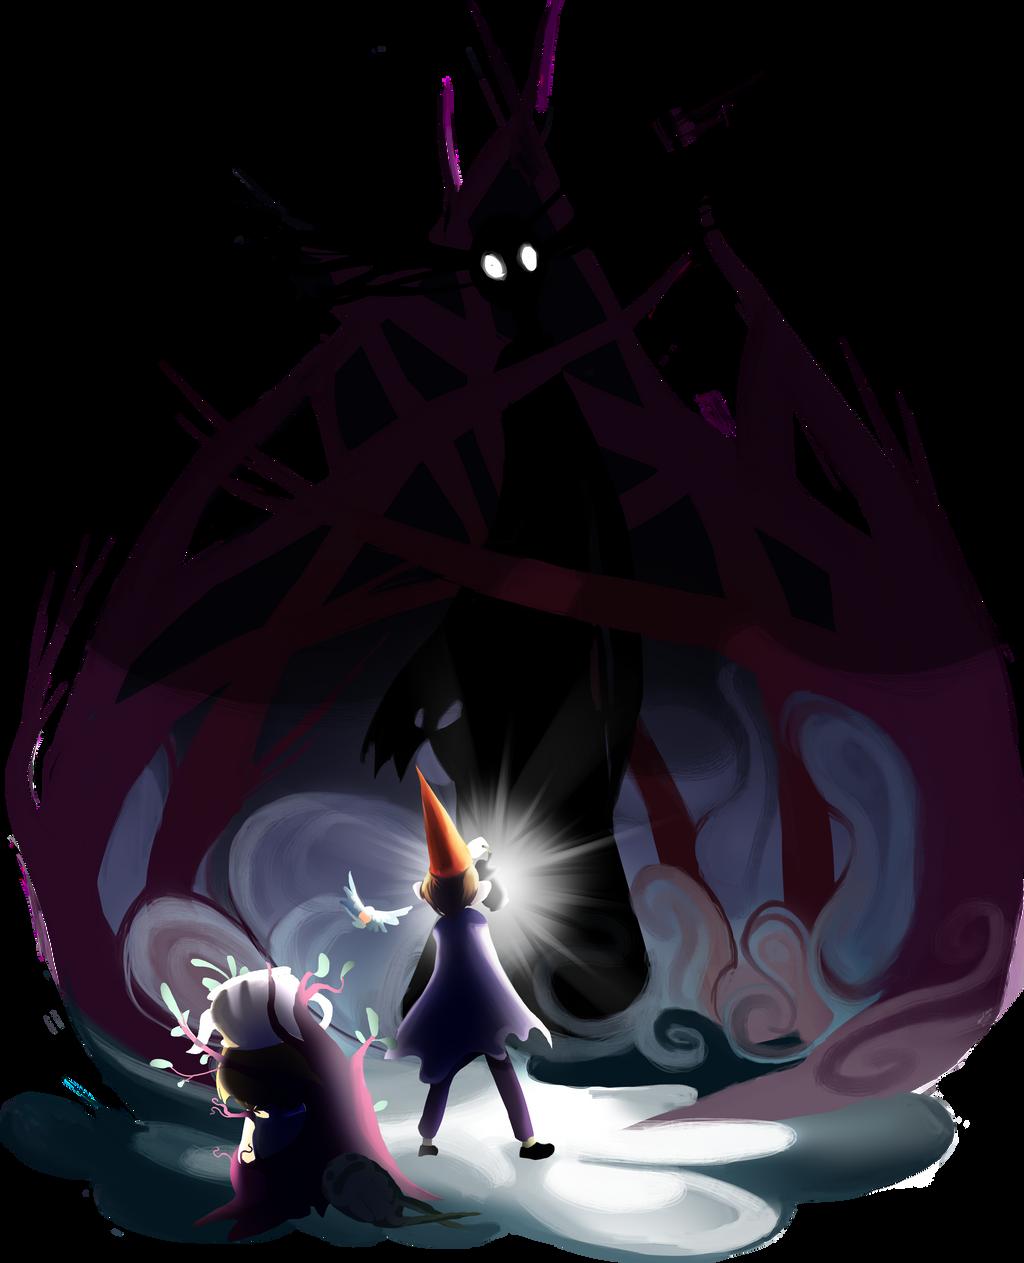 Temptation Of The Beast By Dragonstonet On Deviantart